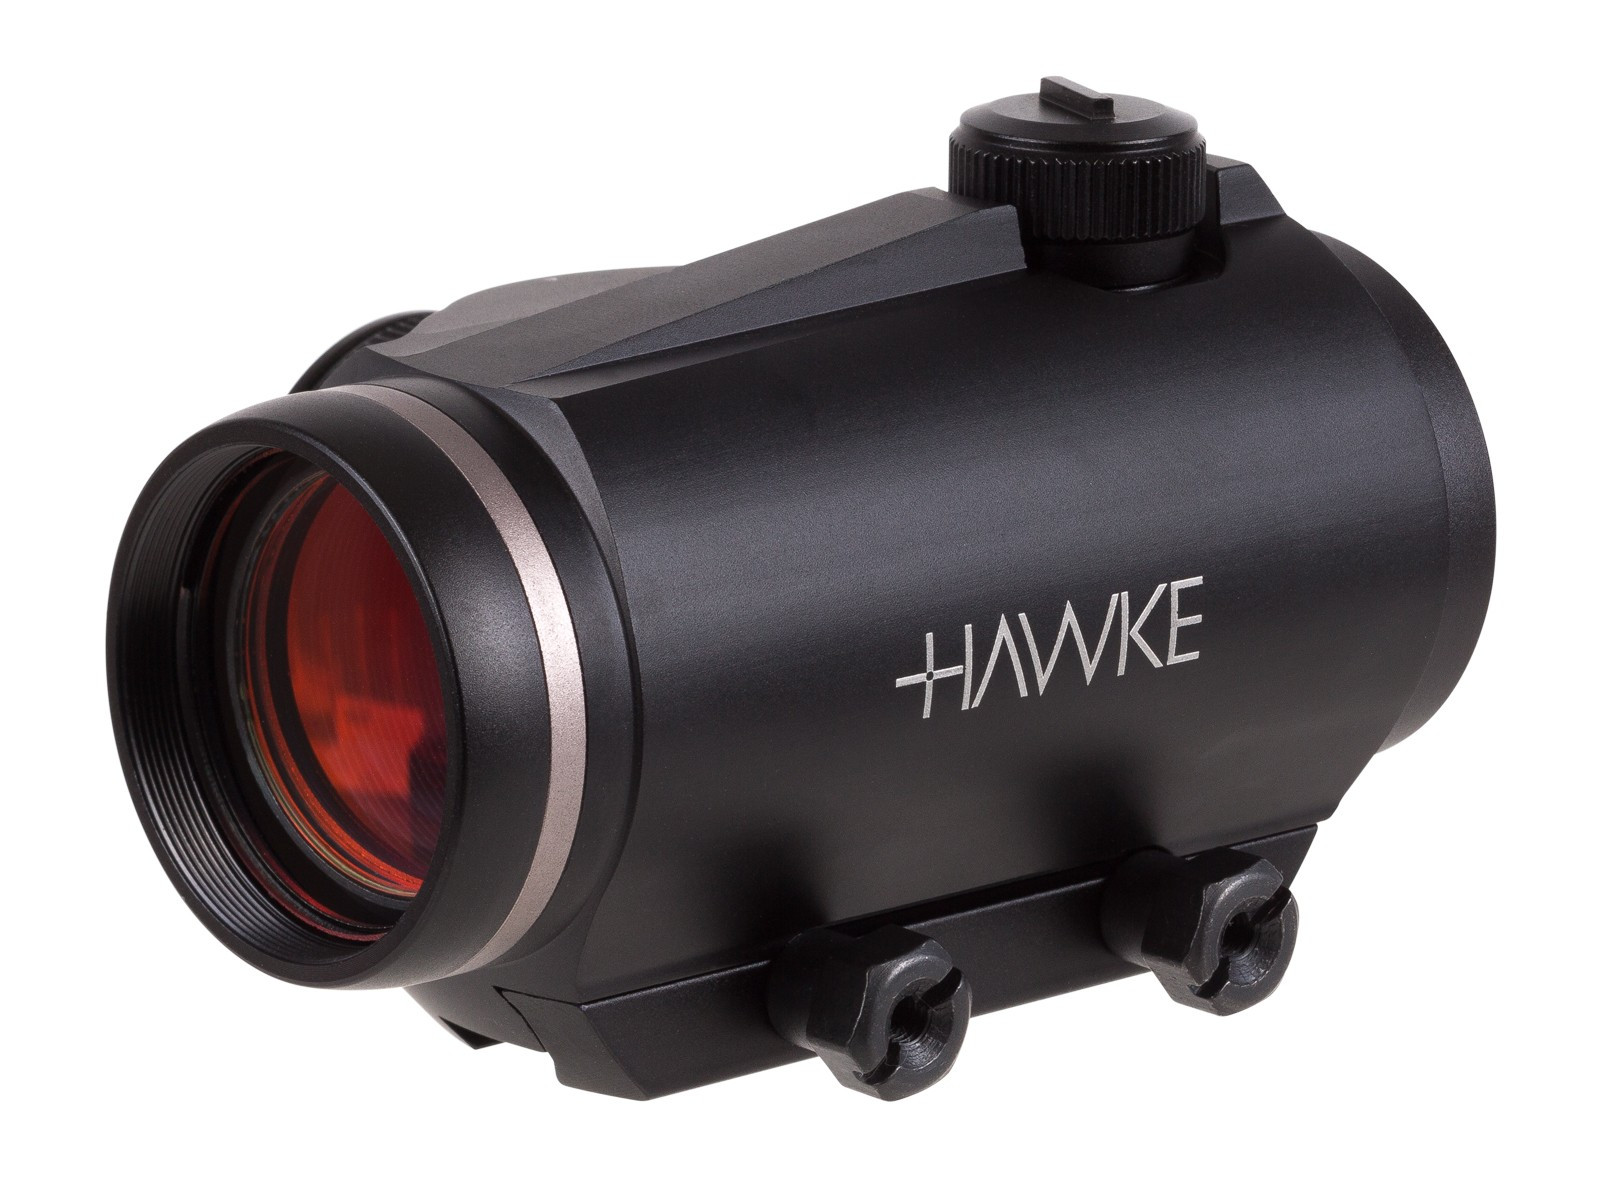 Hawke Vantage RD 1x30 Red Dot Sight